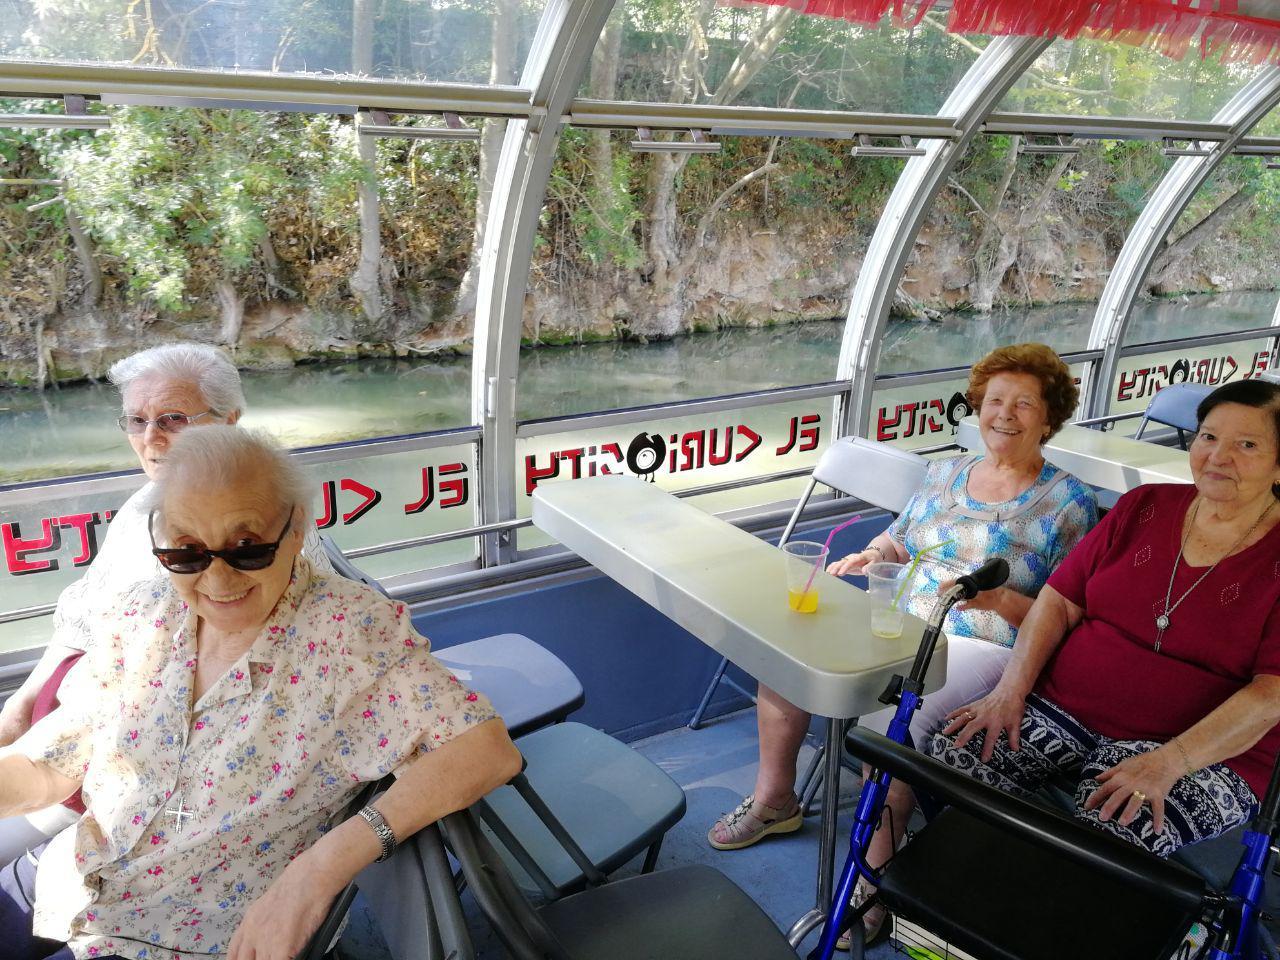 Barco Curiosity Aranjuez (2)